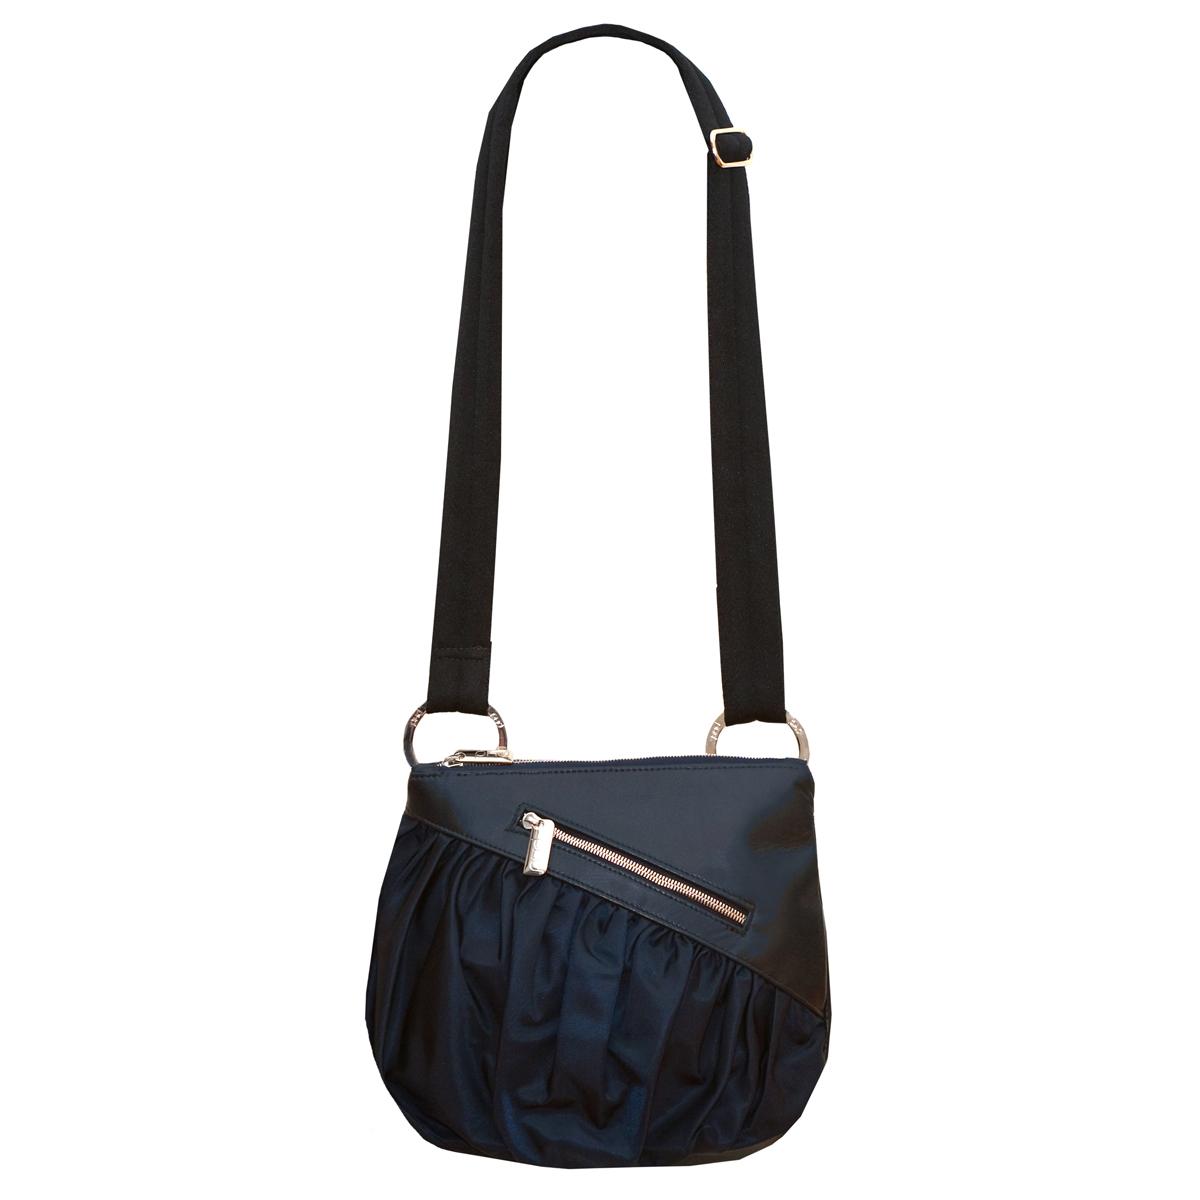 171710ad450 Paige Hamilton Design : The PHD Holiday Handbag Buying Guide